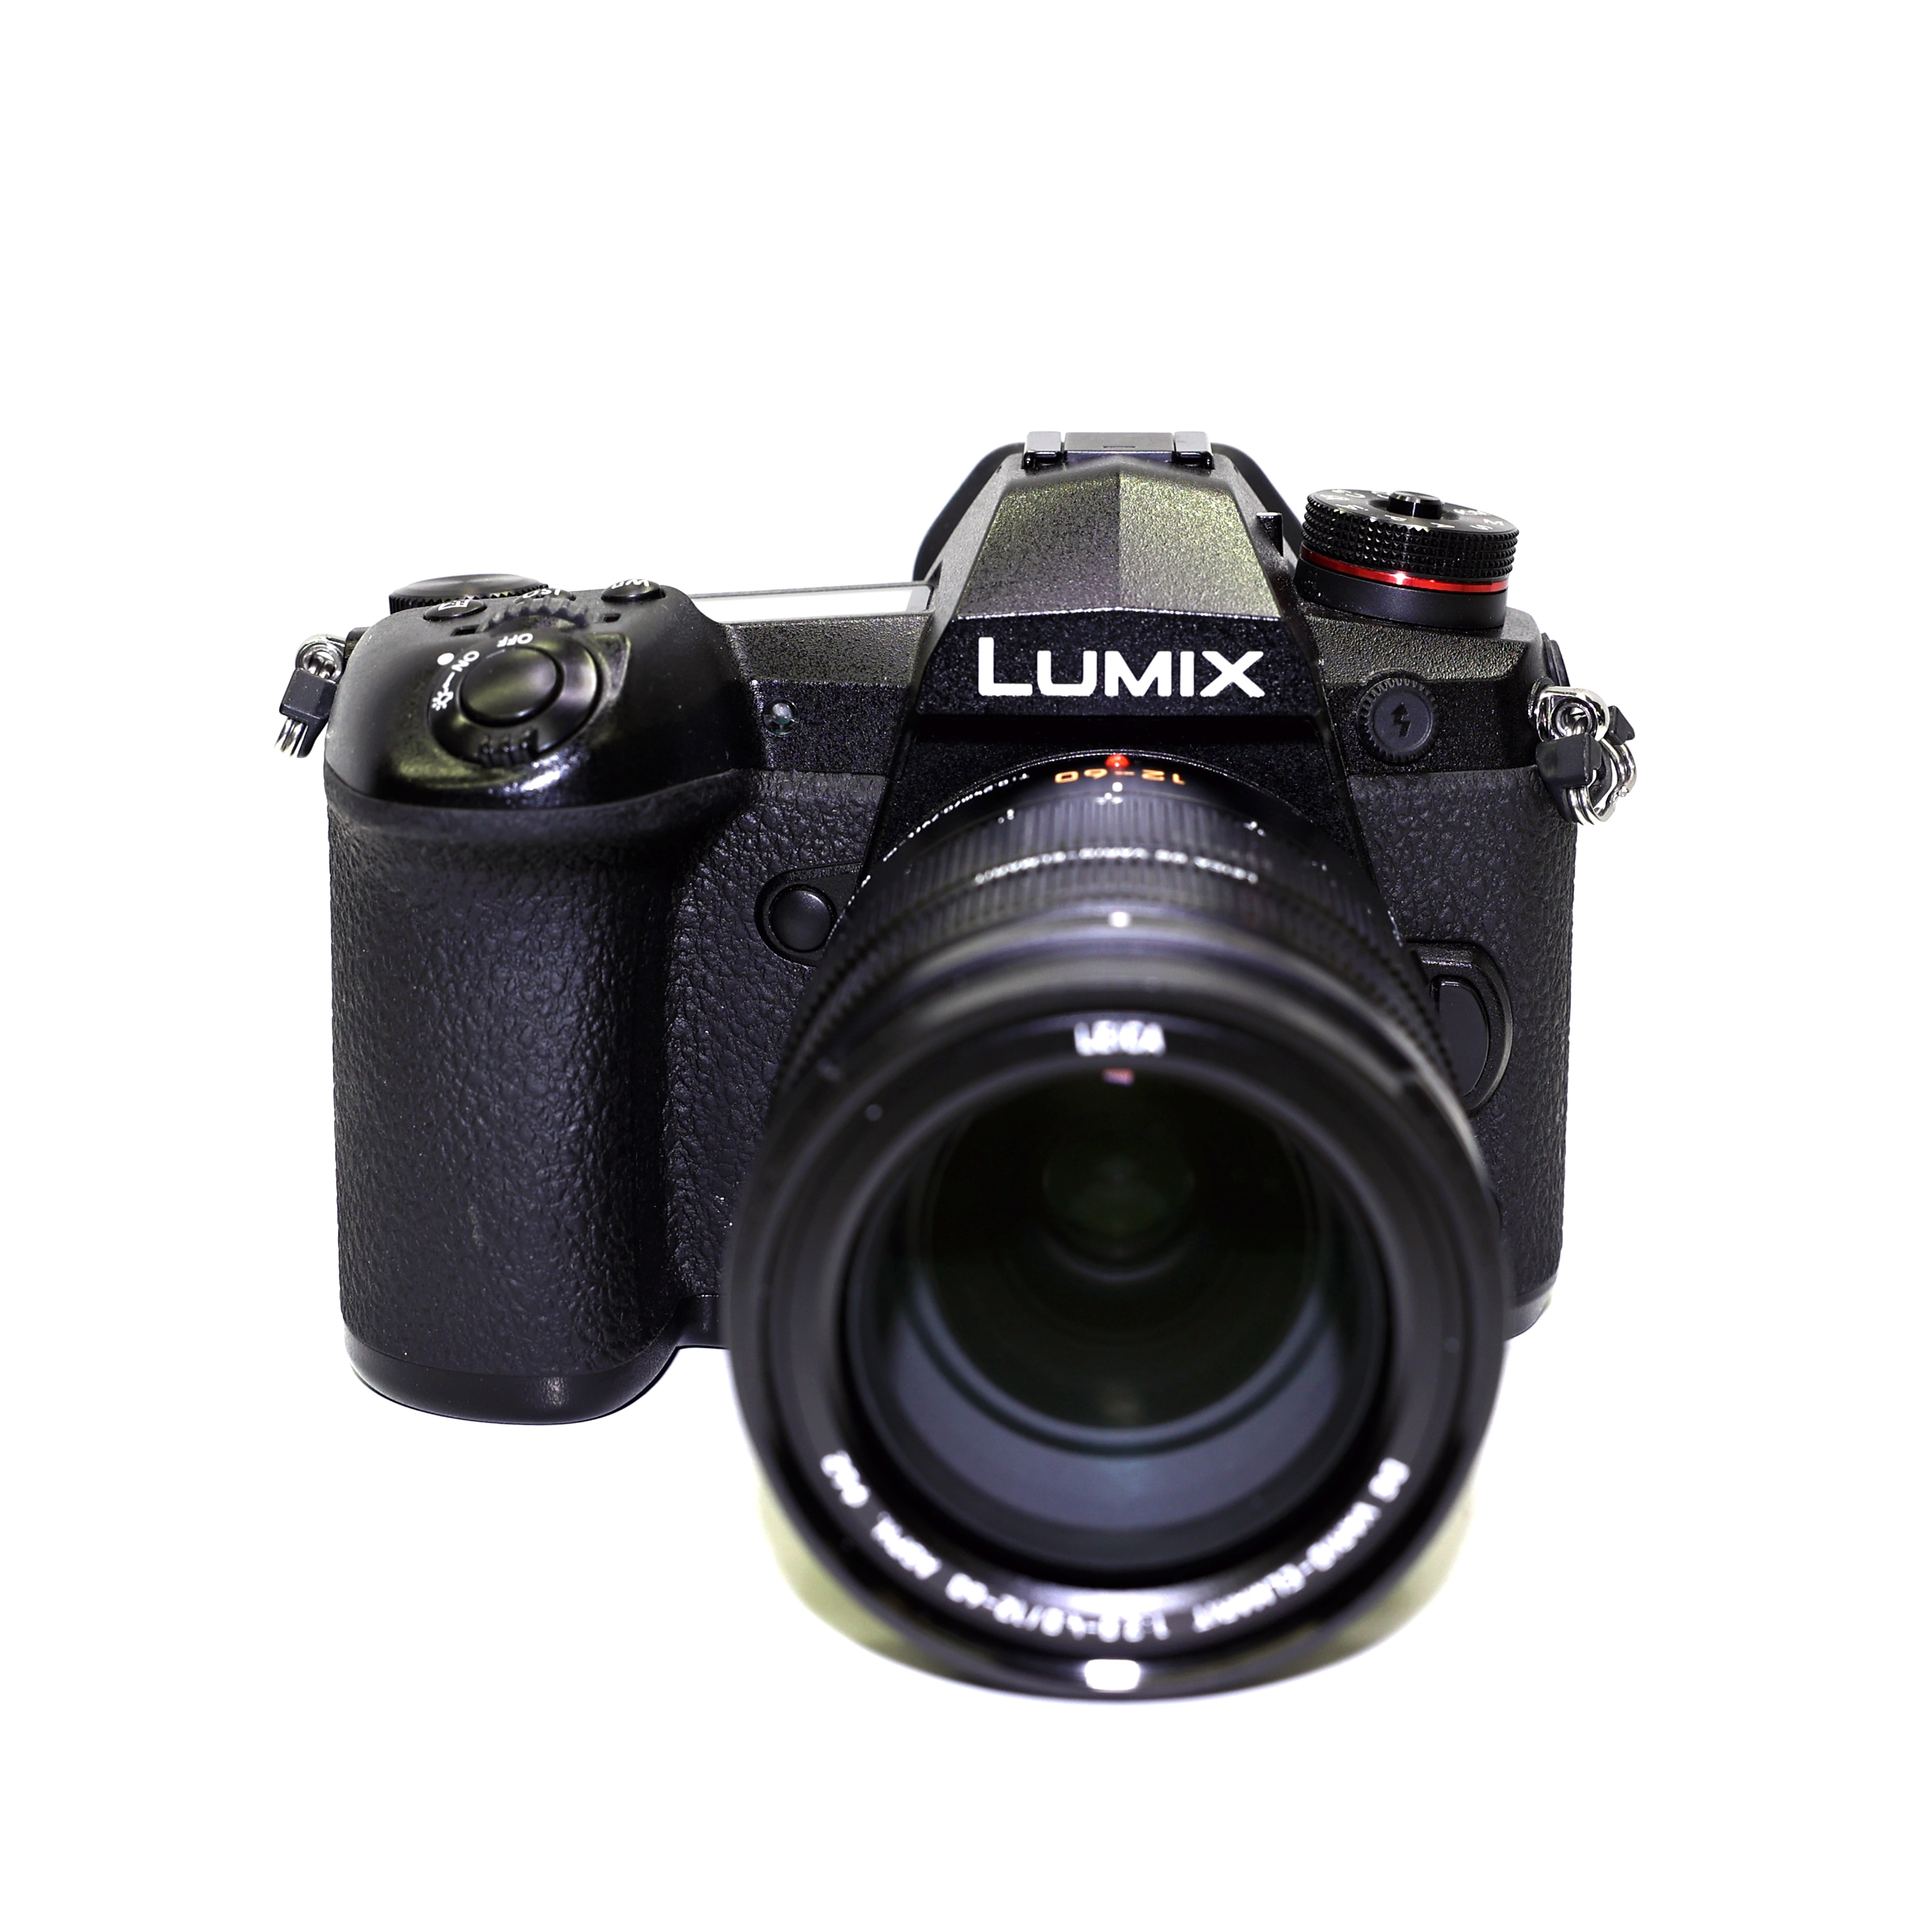 Panasonic G9 + Leica 12-60mm f/2.8-4.0 ASPH Power O.I.S. - Fyndvara